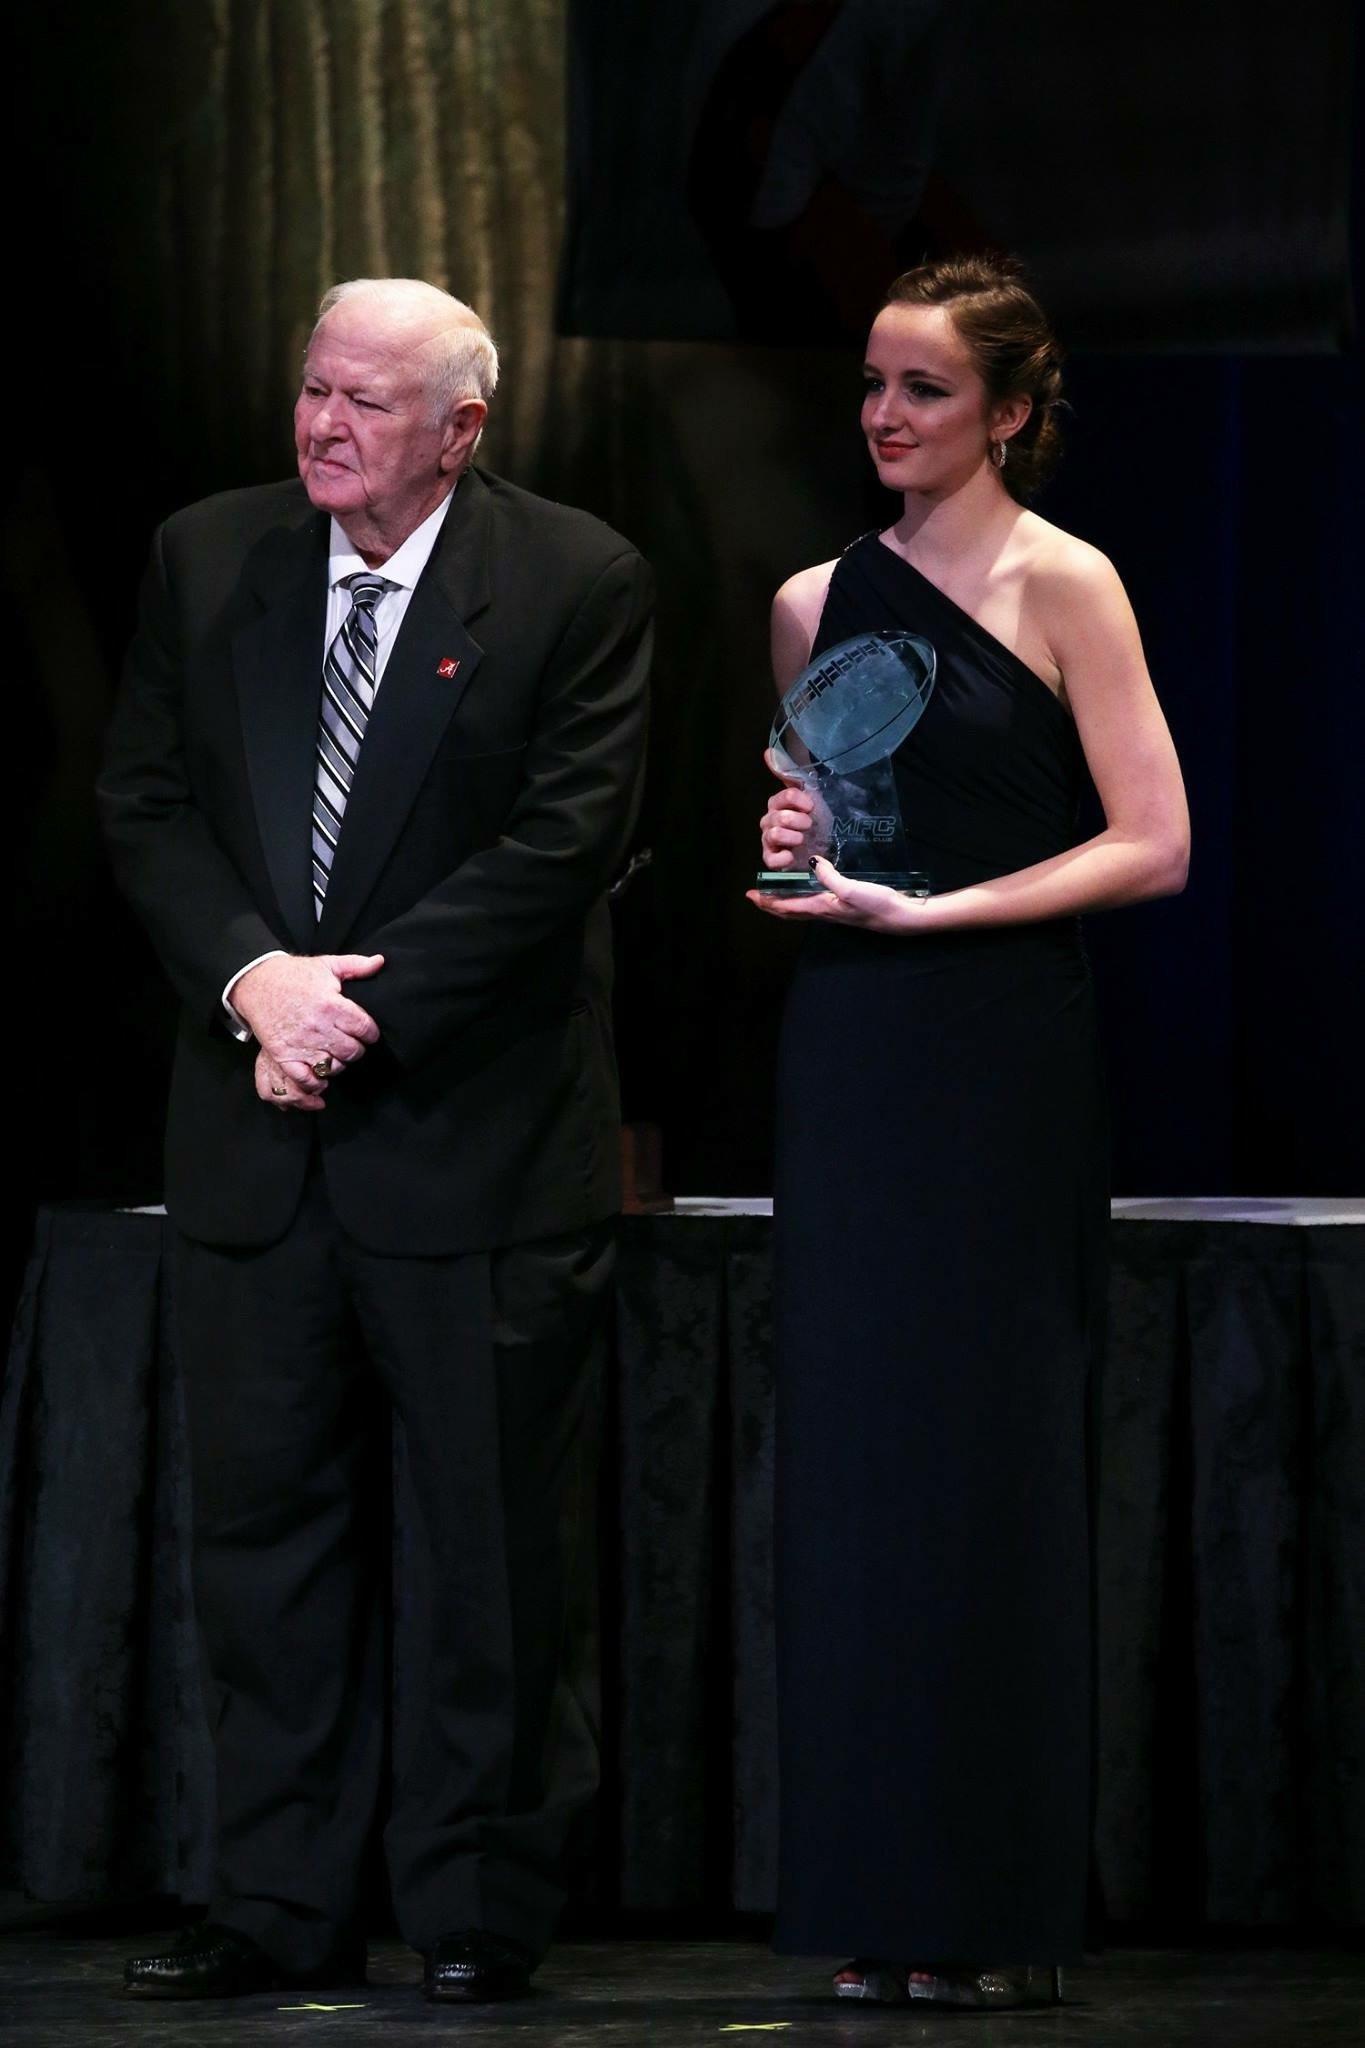 sponsor of the 2016 George Munger Award